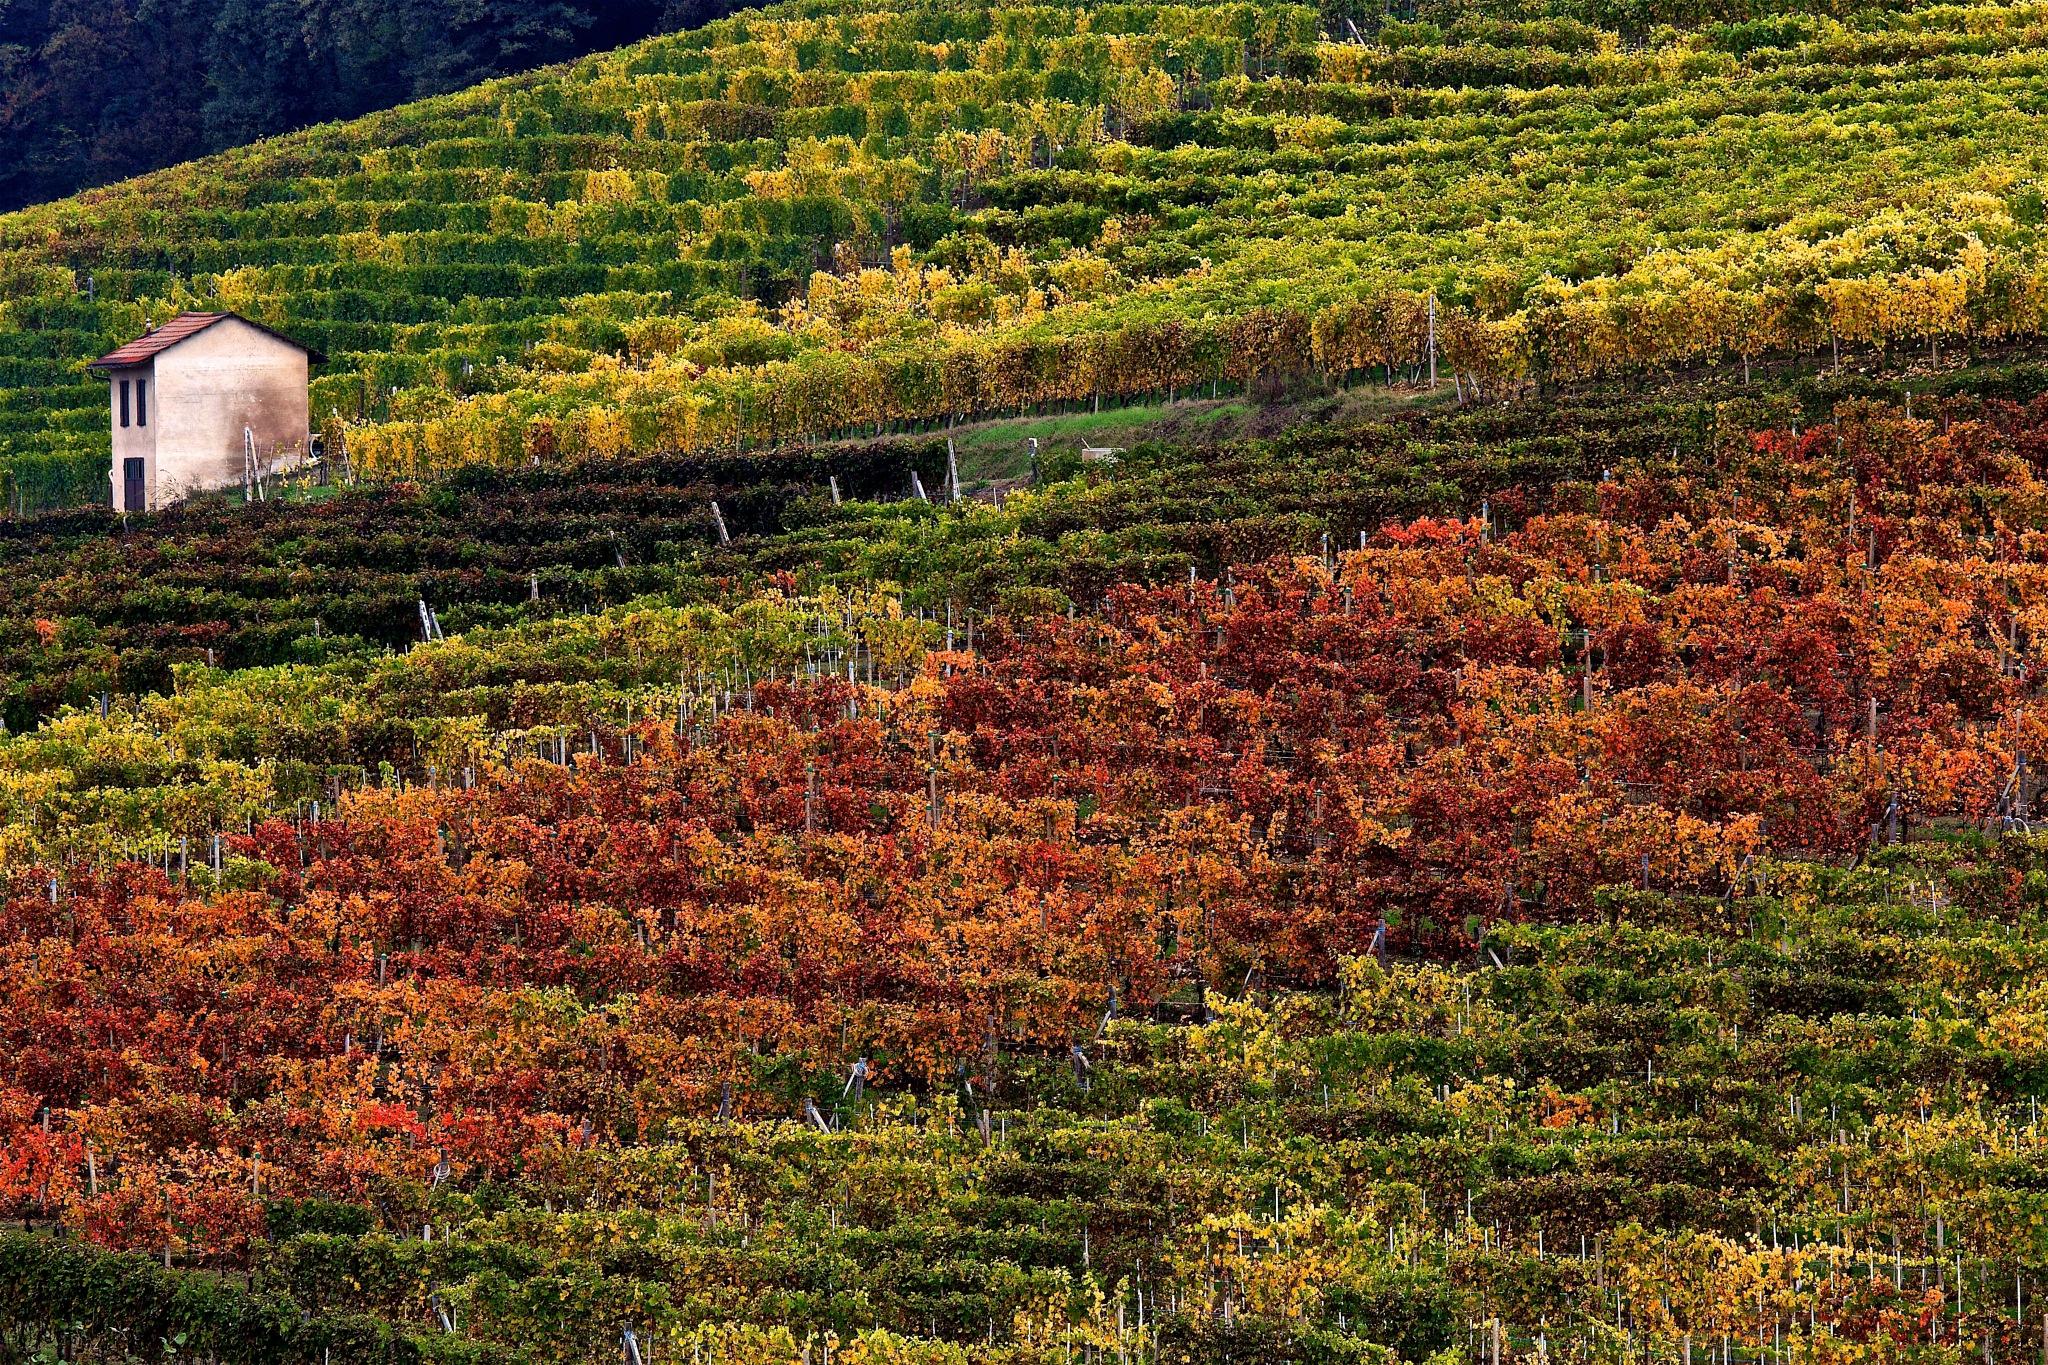 Walking through the vineyards by Giovanni Battagliola